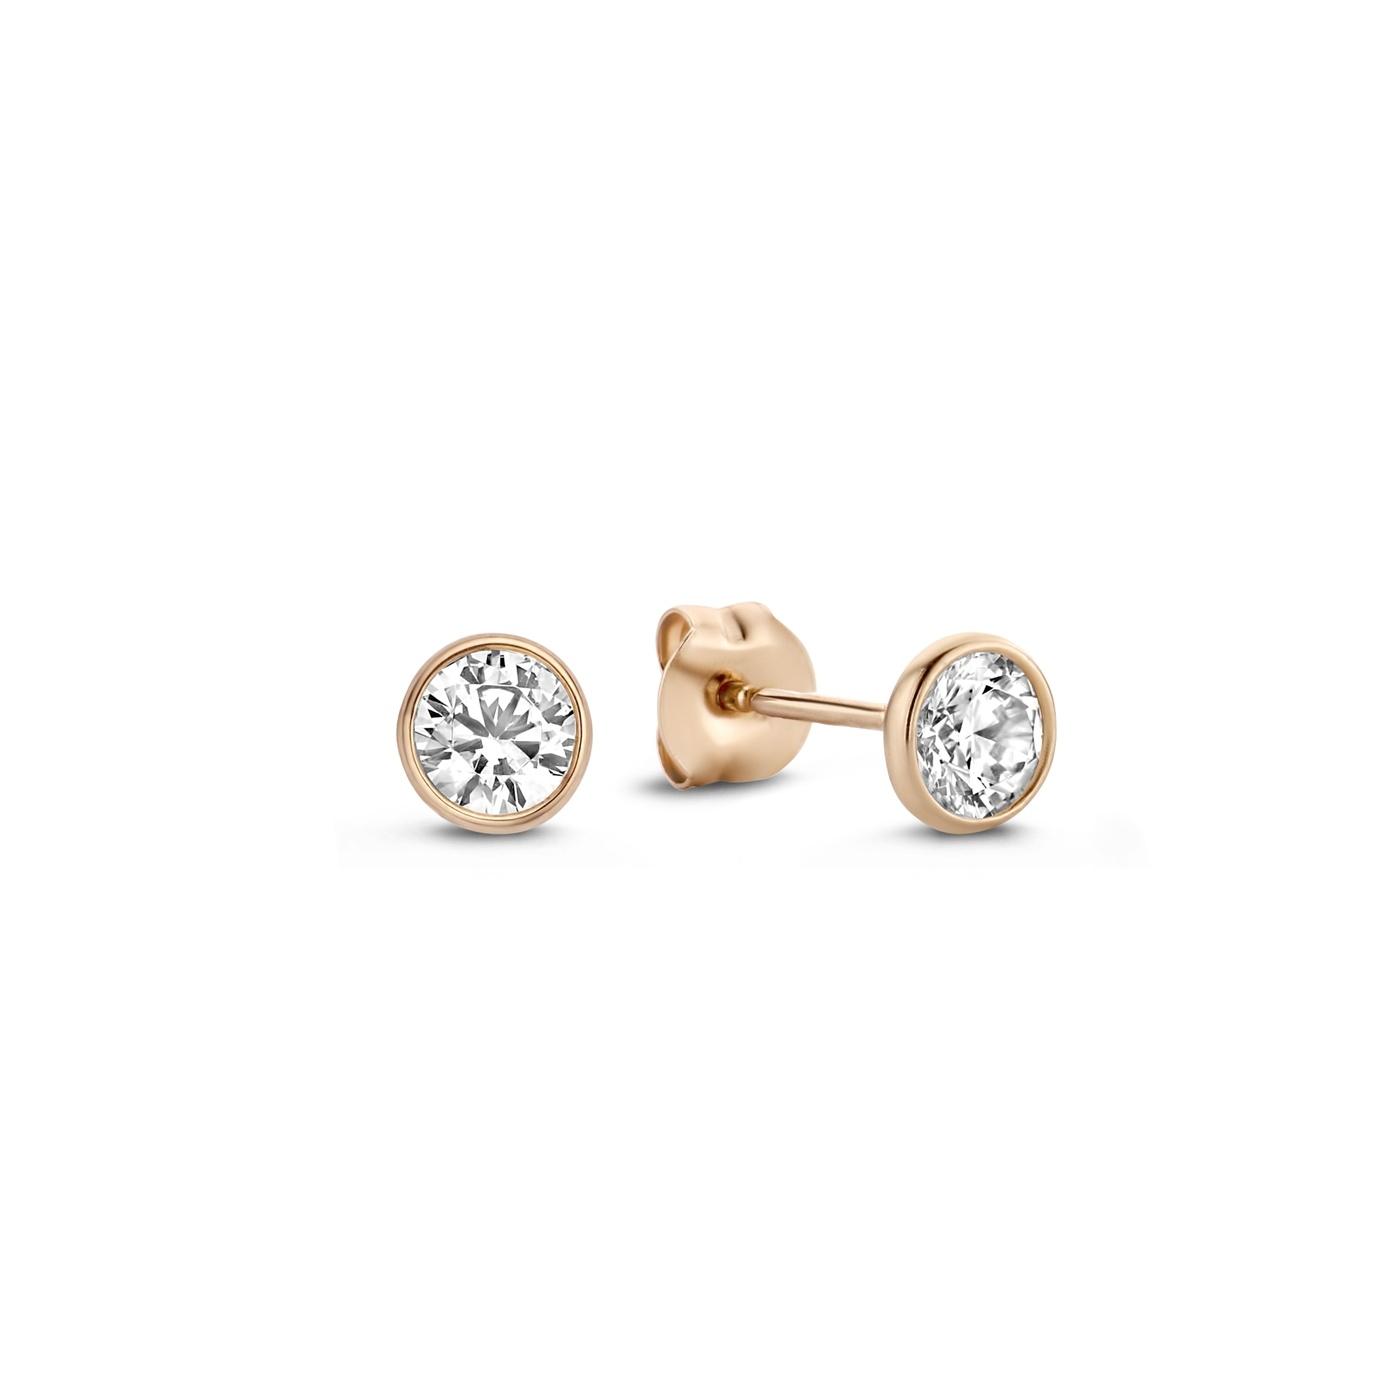 Isabel Bernard La Concorde Loane 14 carat rose gold ear buds zirconia